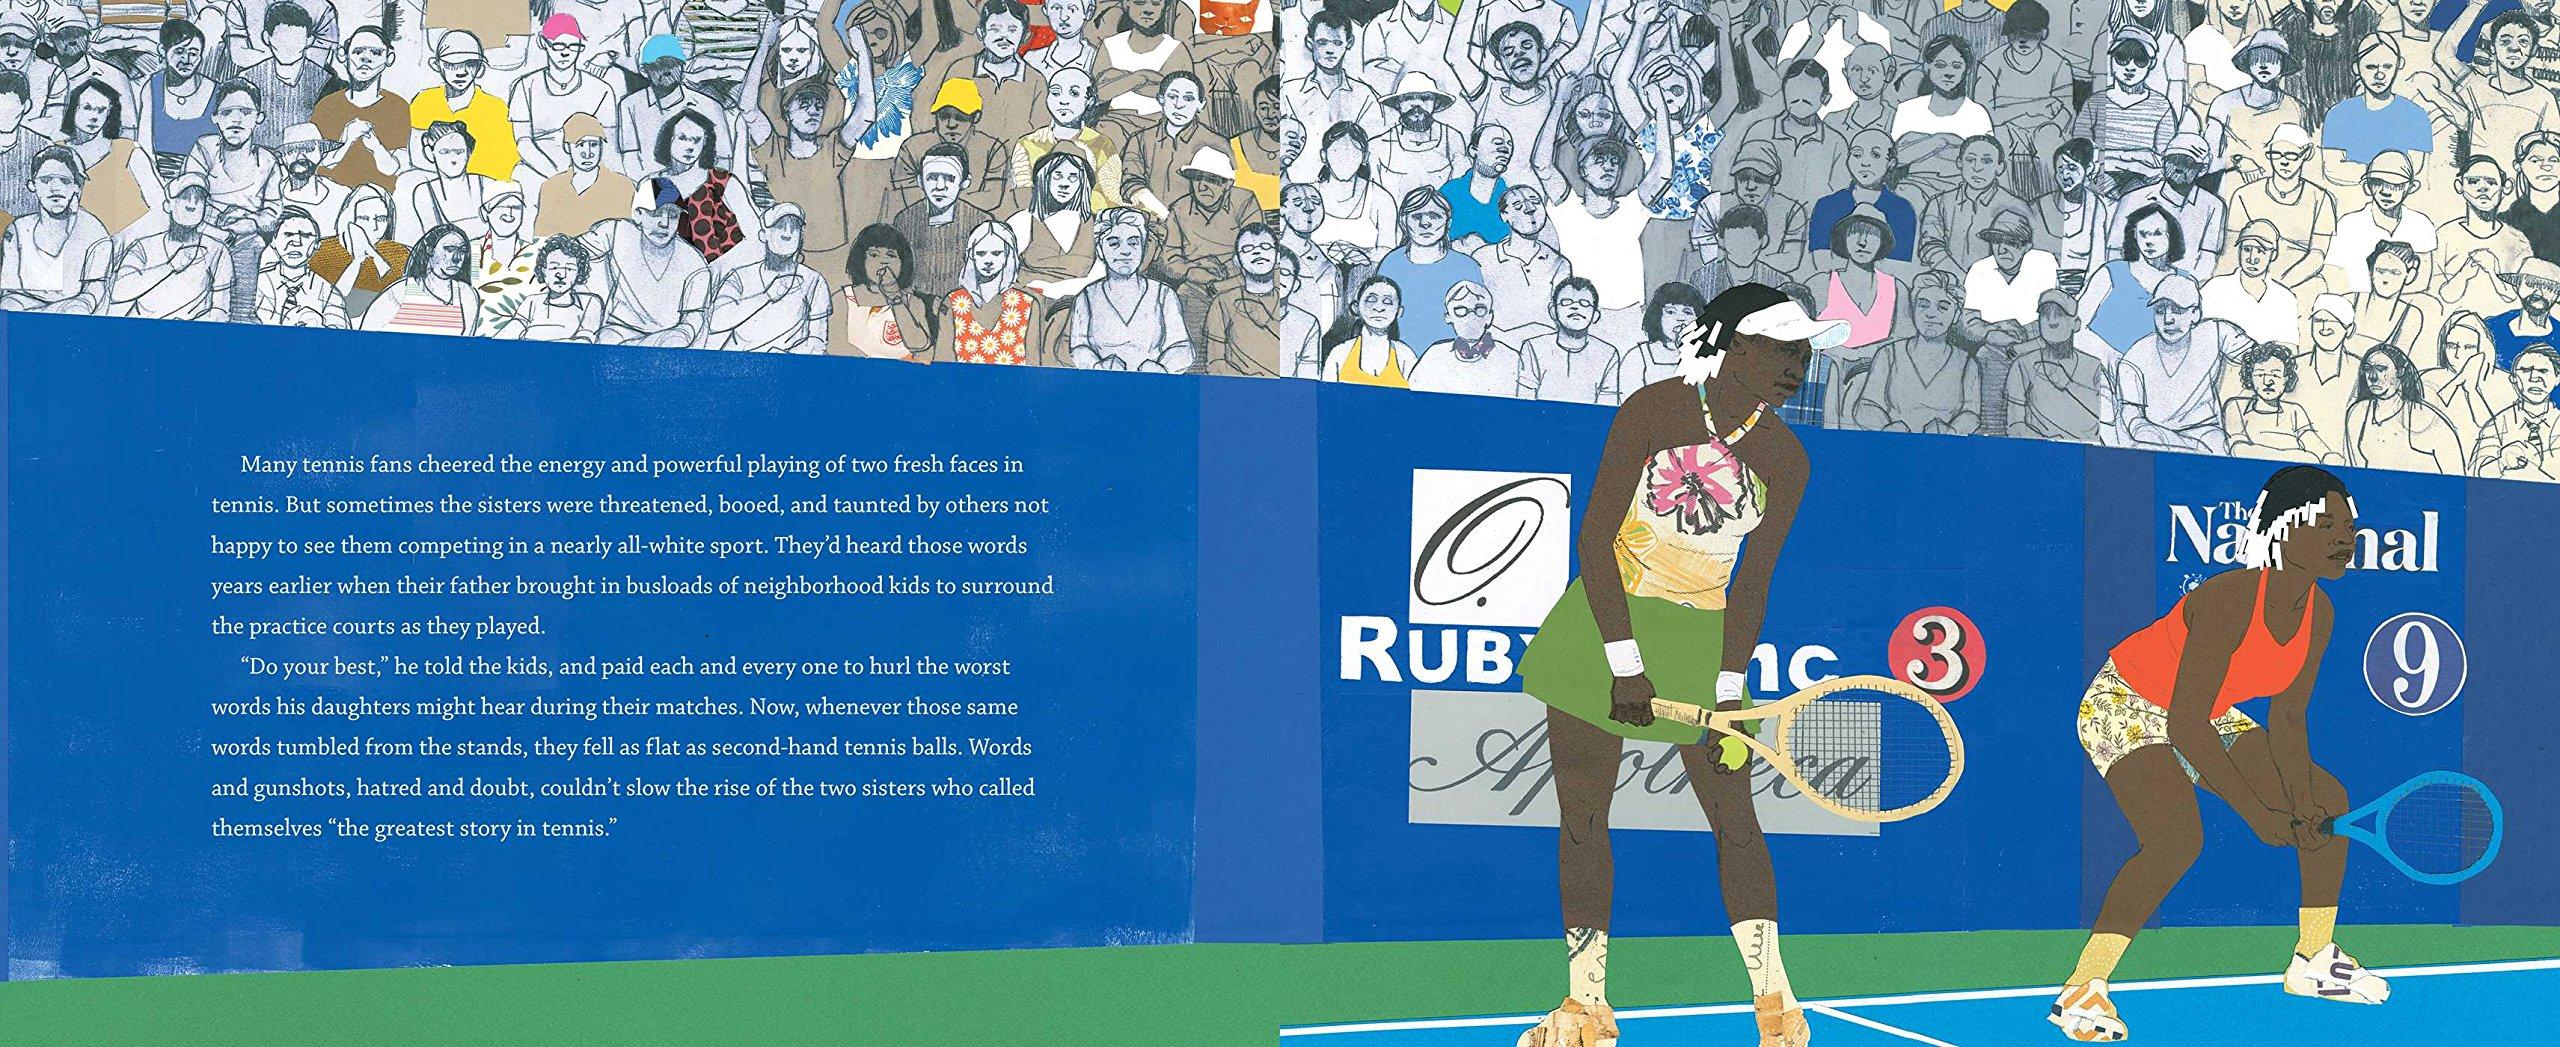 Game Changers: The Story of Venus and Serena Williams: Amazon.es: Lesa Cline-Ransome, James E. Ransome: Libros en idiomas extranjeros